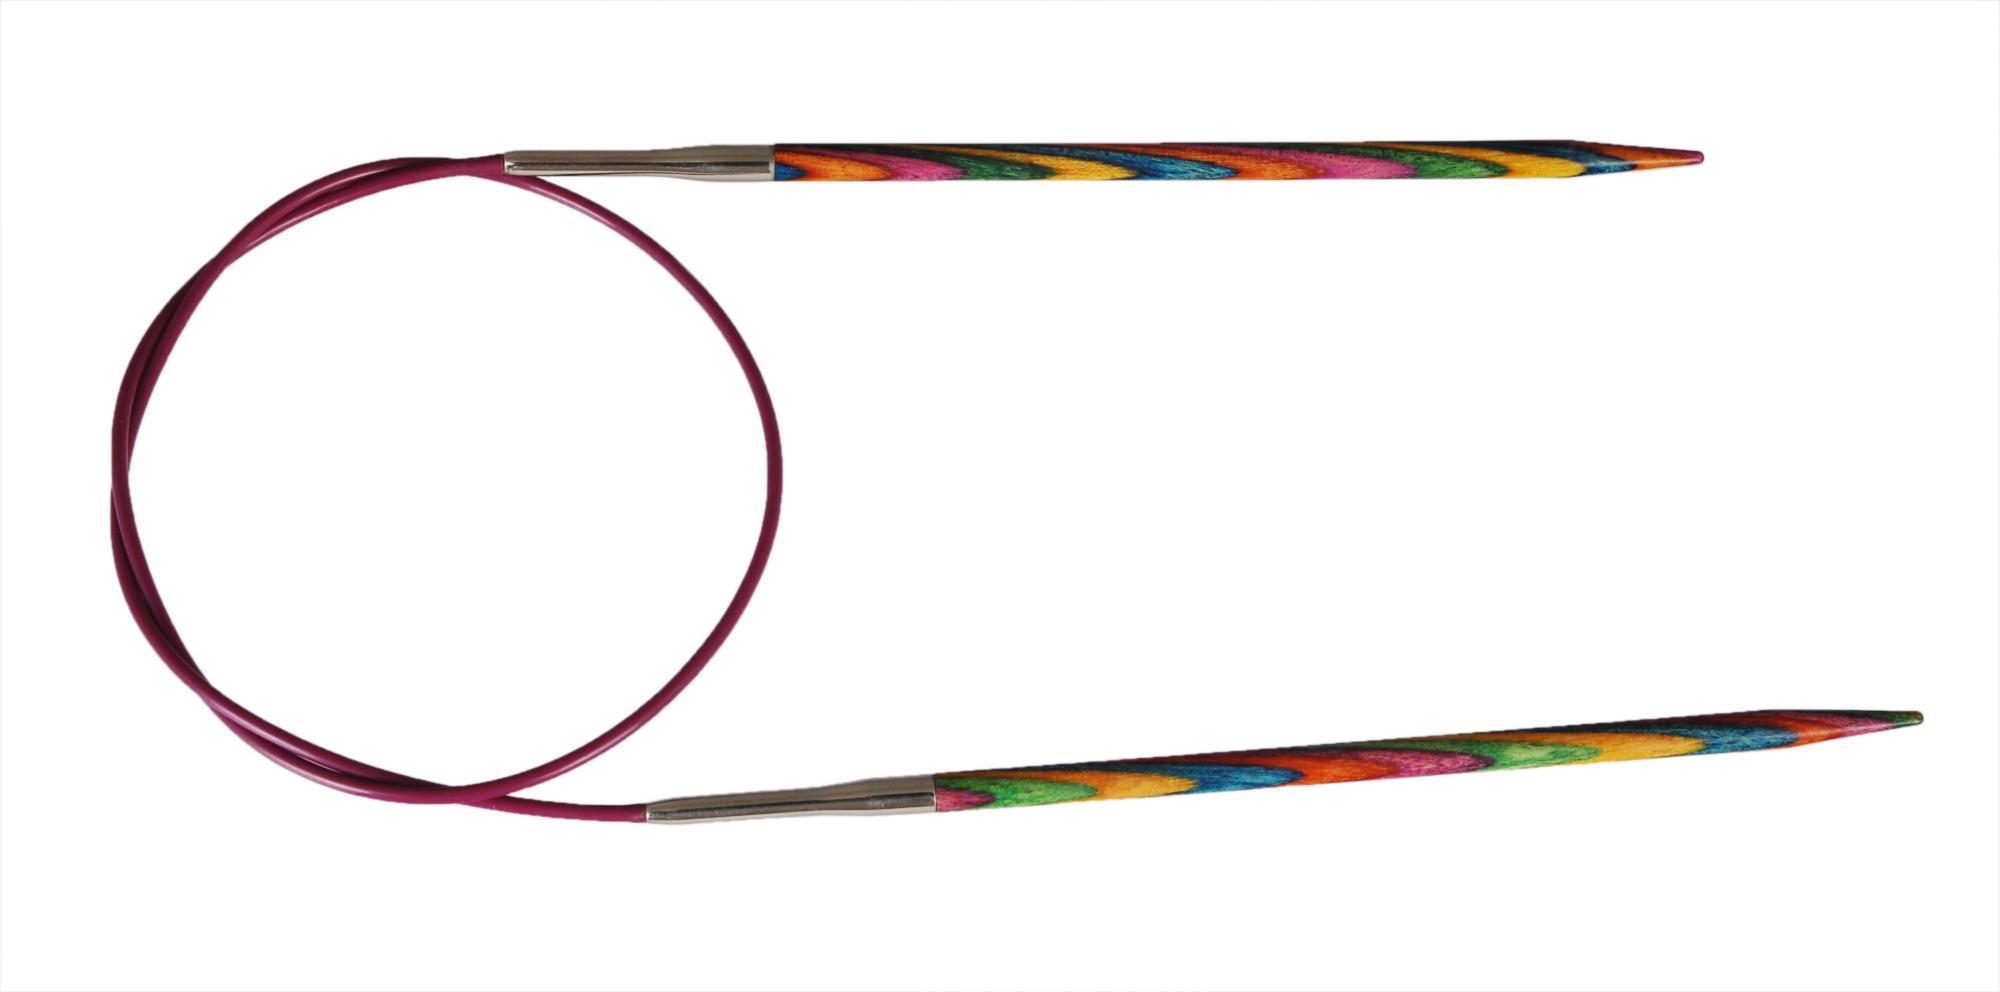 Спицы круговые 50 см Symfonie Wood KnitPro, 20384, 2.75 мм